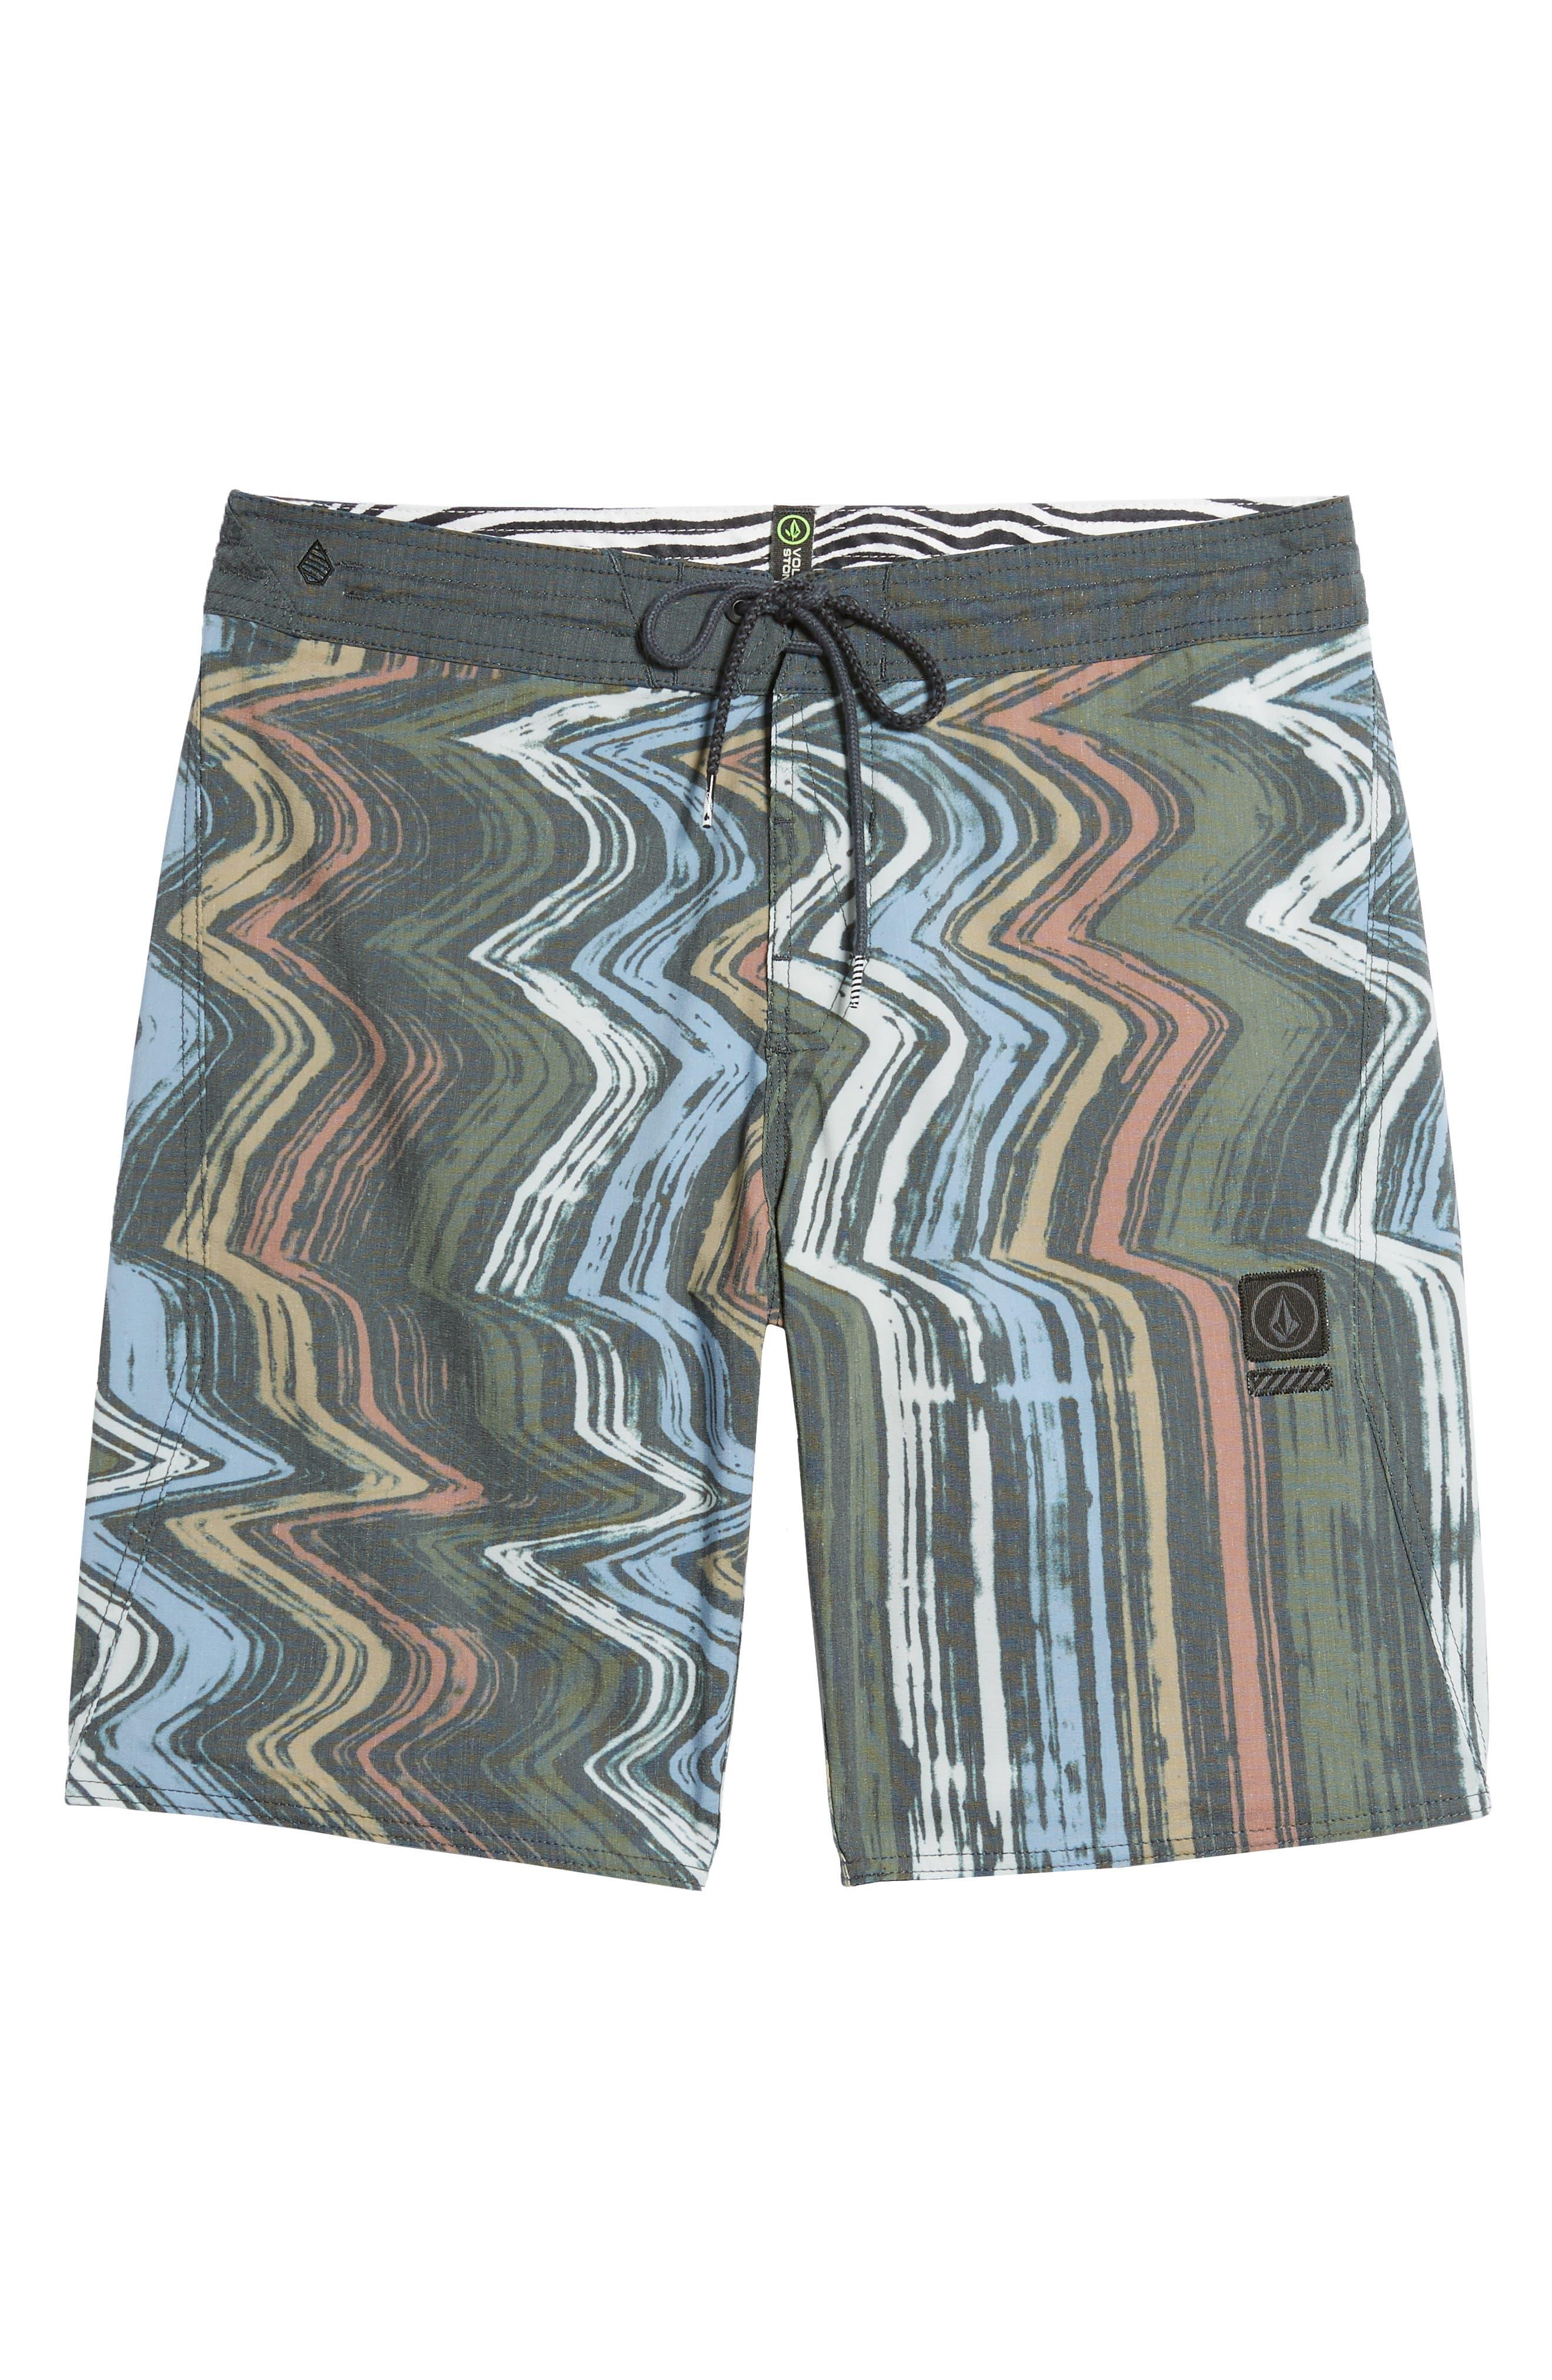 Lo-Fi Stoney Board Shorts,                             Alternate thumbnail 6, color,                             Stealth